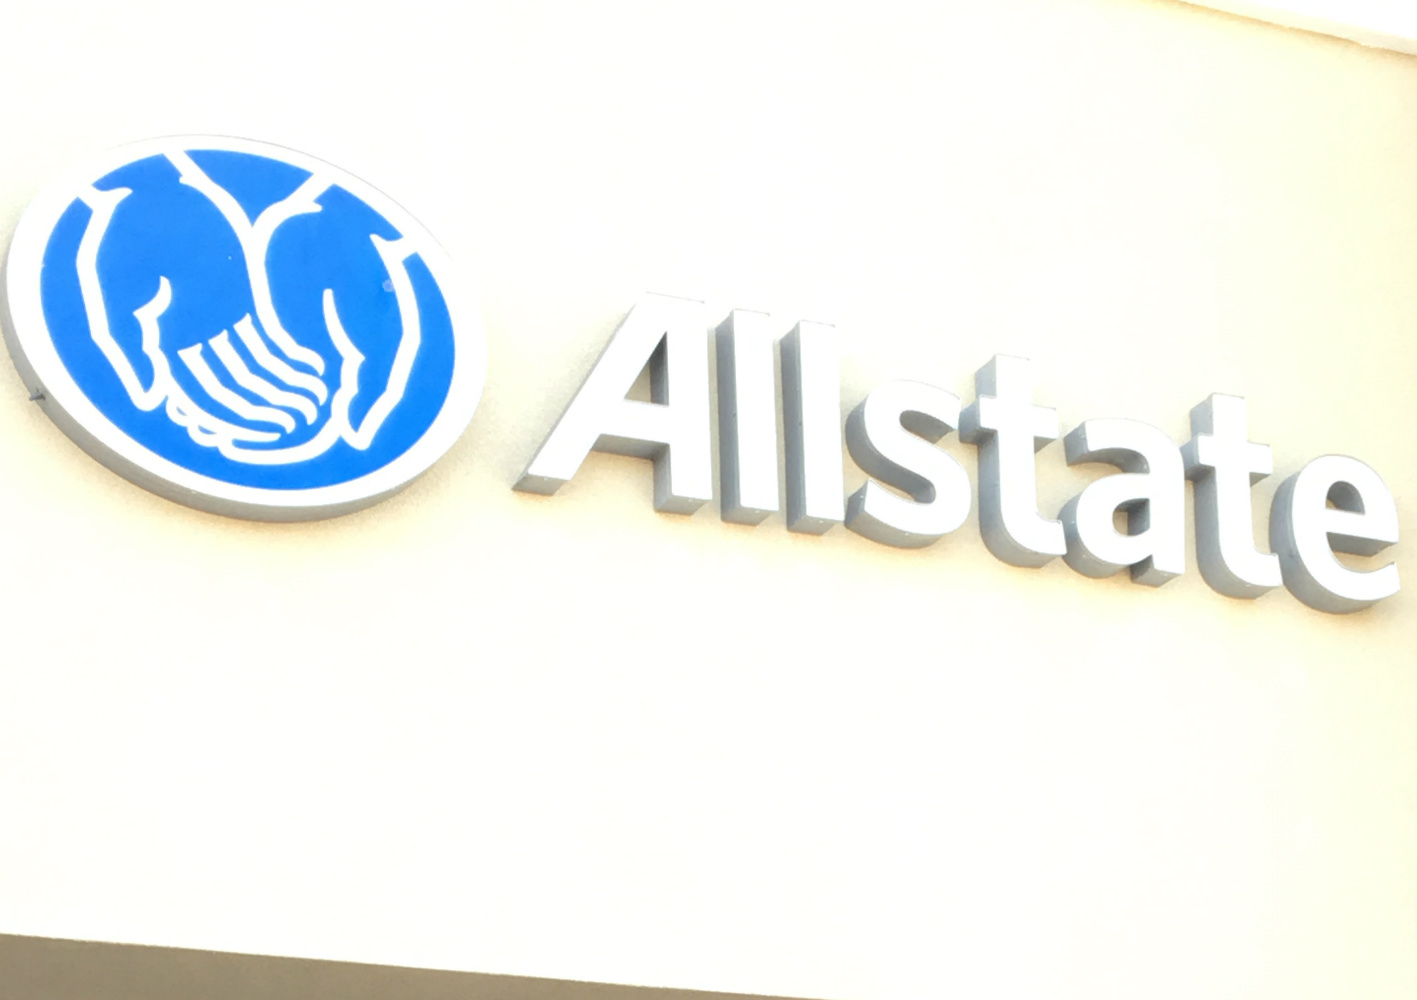 John E. Anderson: Allstate Insurance image 1